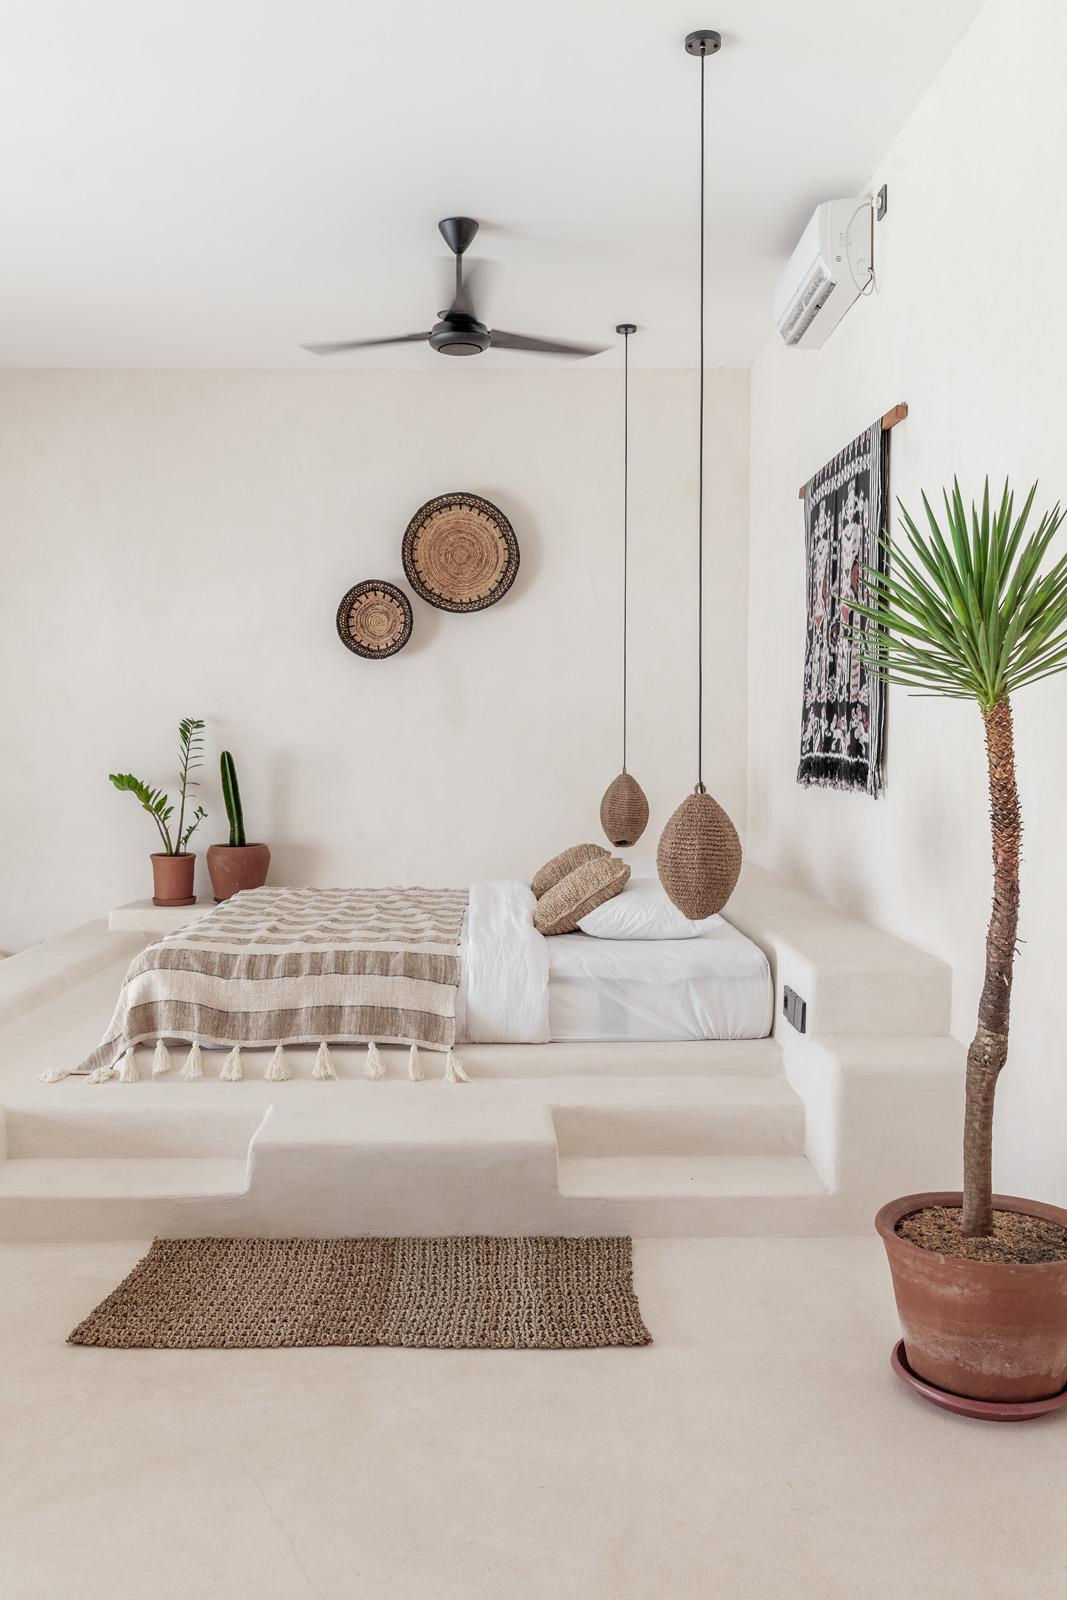 Bali Interiors Yucca Villa Canggu, Perenenan hotel accomodation